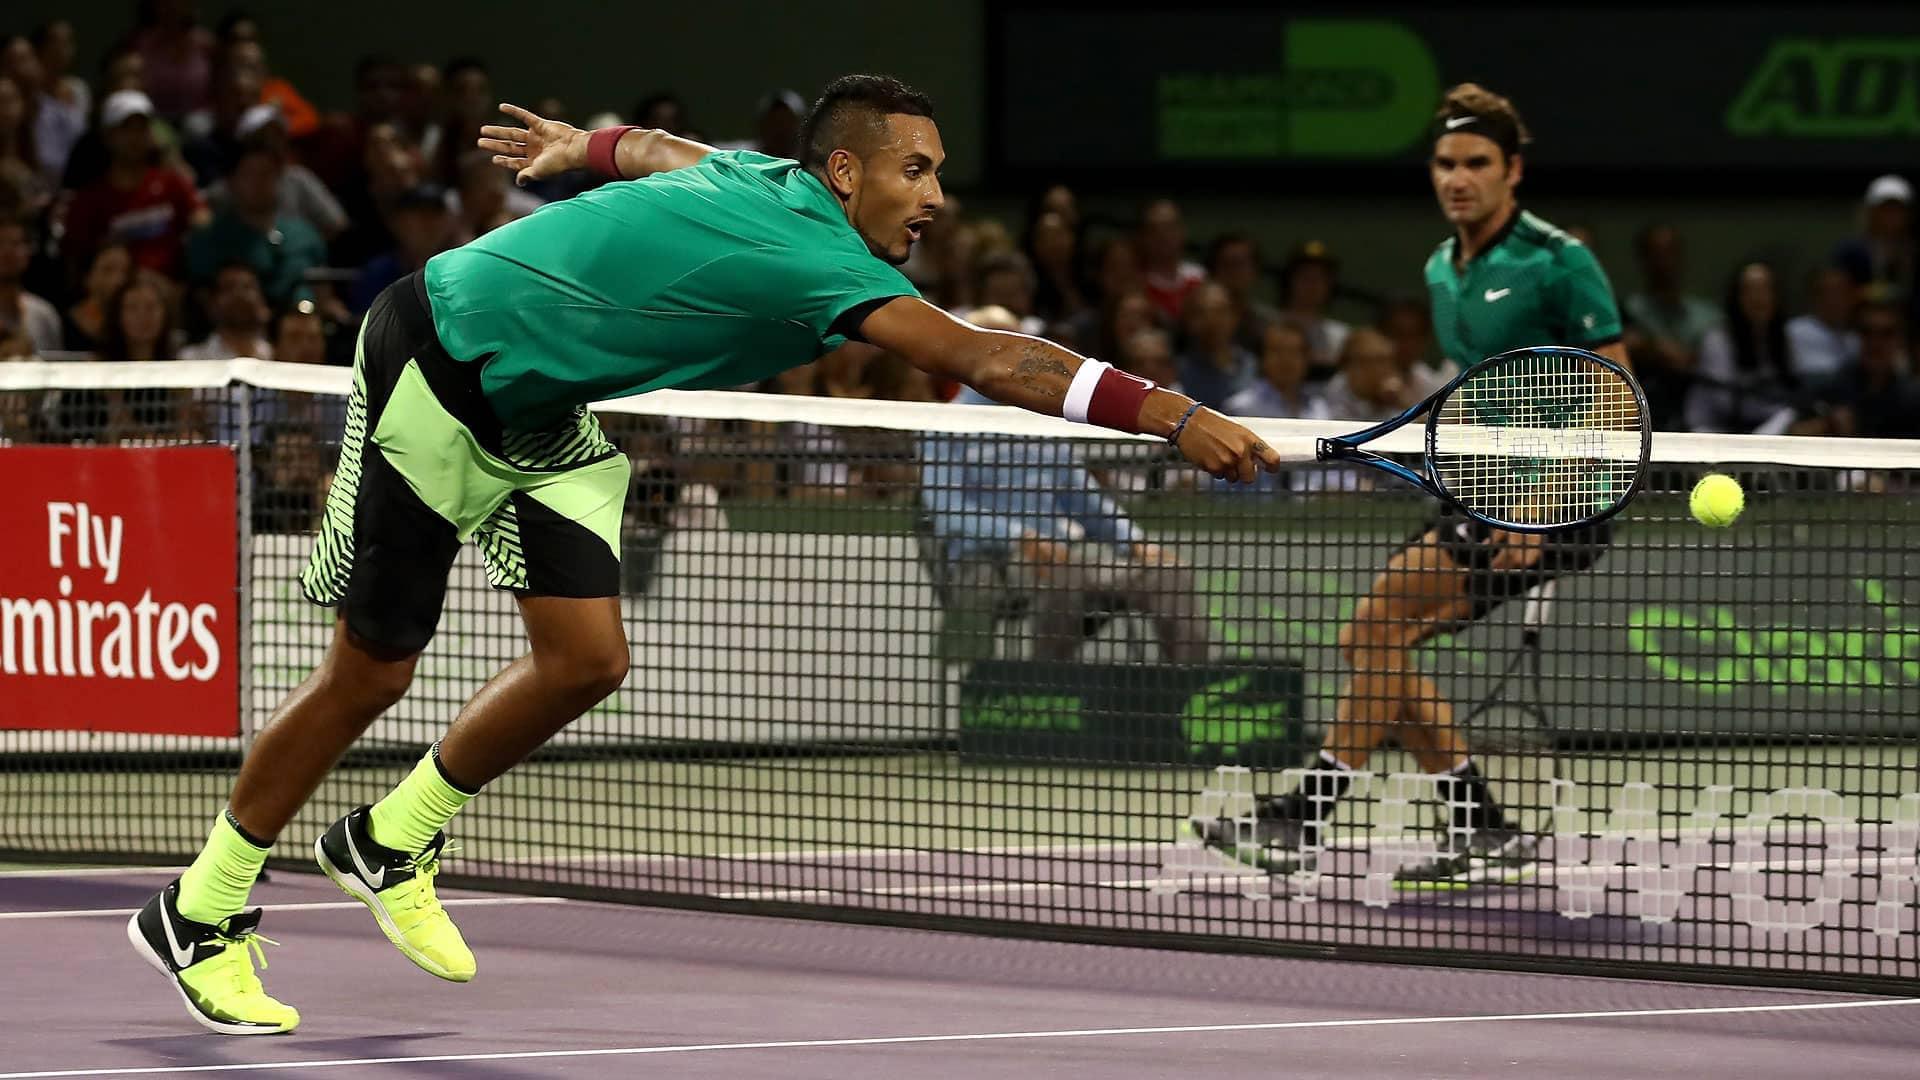 Federer/Kyrgios